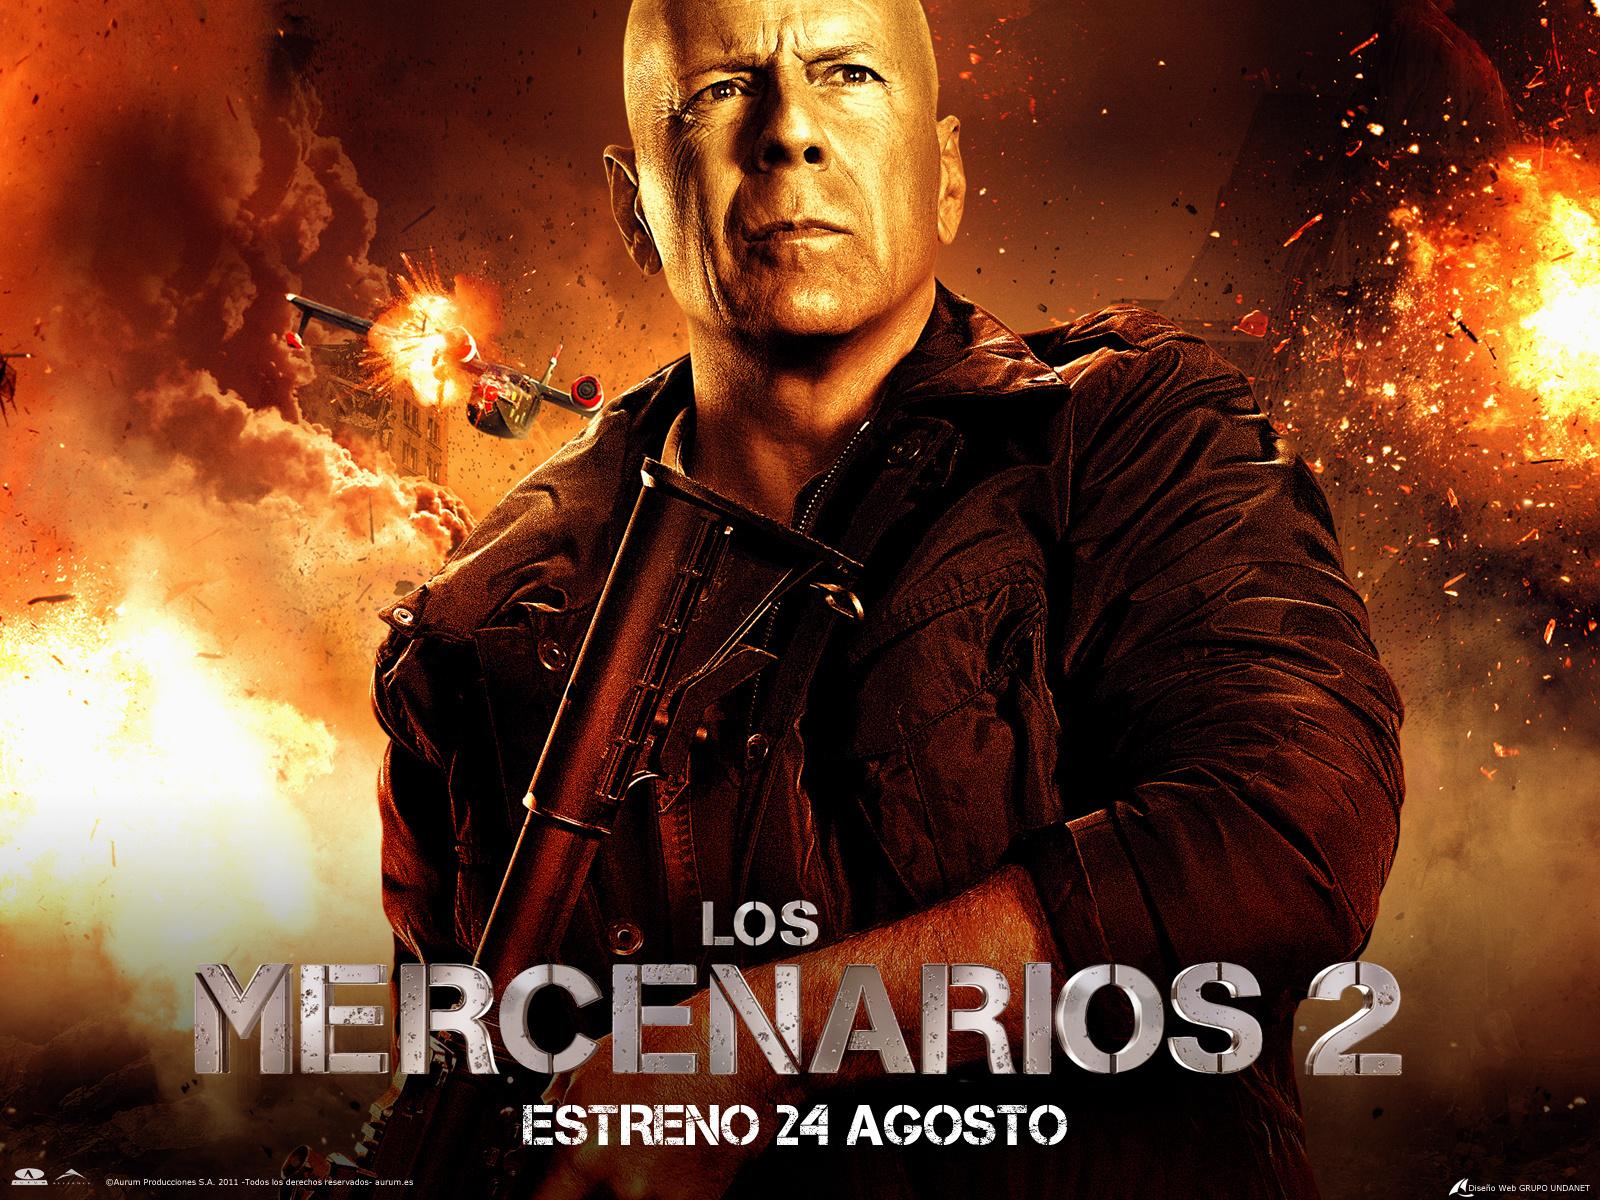 Bilder The Expendables 2010 Bruce Willis Film Bruce Willis